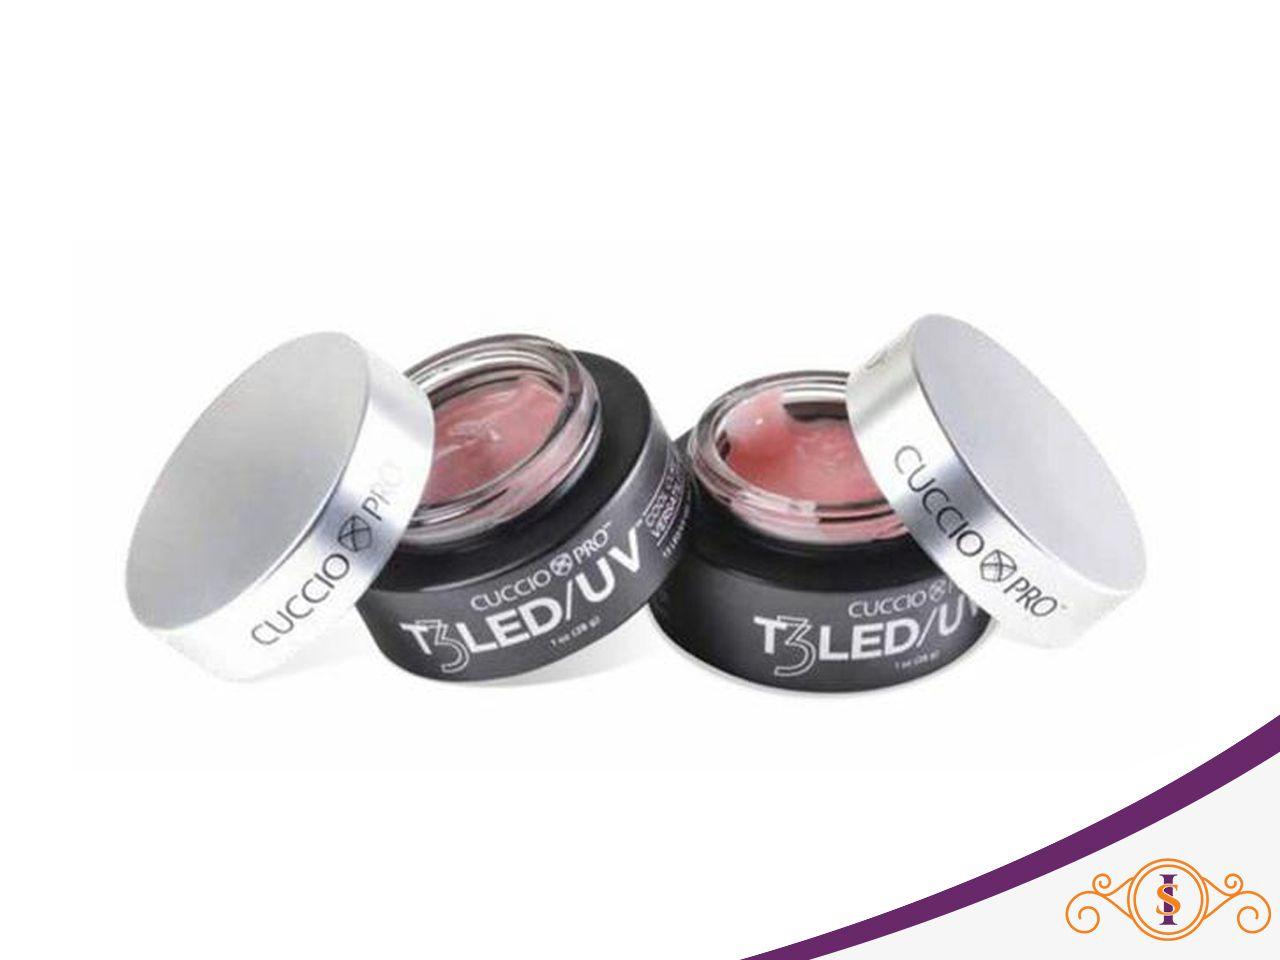 Gel - T3 Controlled Led/Uv - Pink - 56g